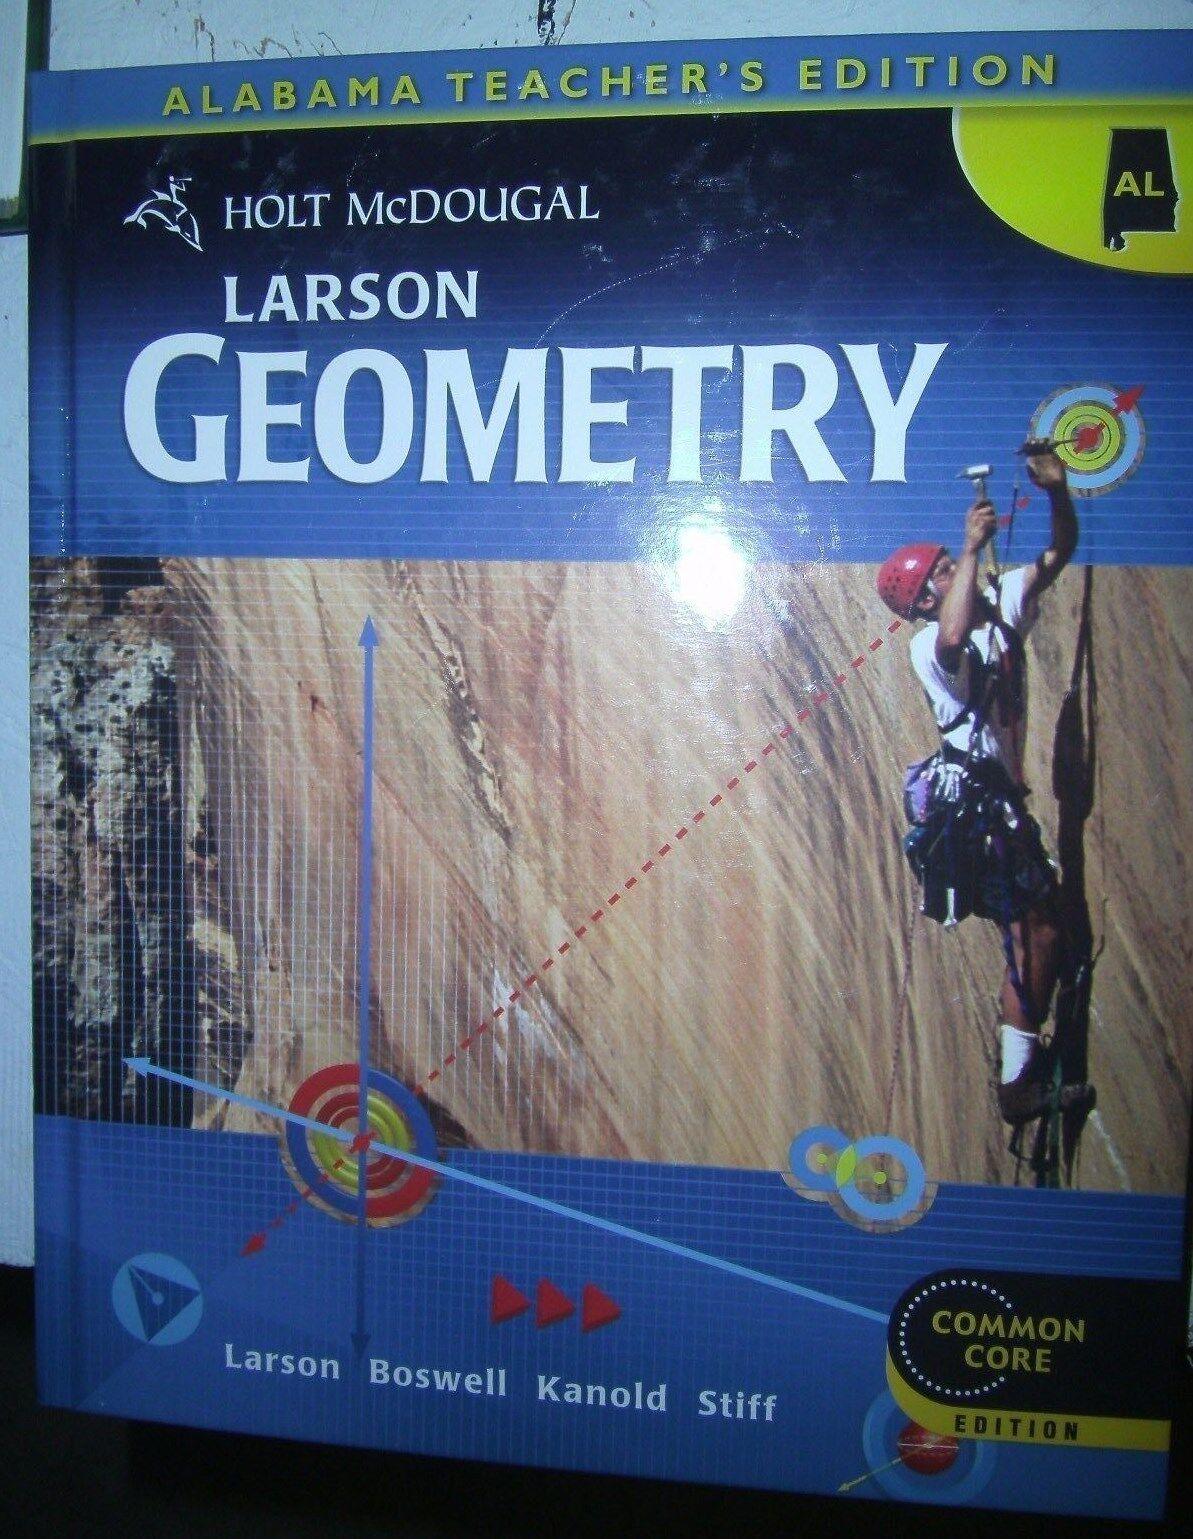 holt mcdougal larson geometry alabama teacher ed 2012 common core rh ebay com Holt McDougal Geometry Lesson 6 1 Practice Holt McDougal Geometry Common Core Edition